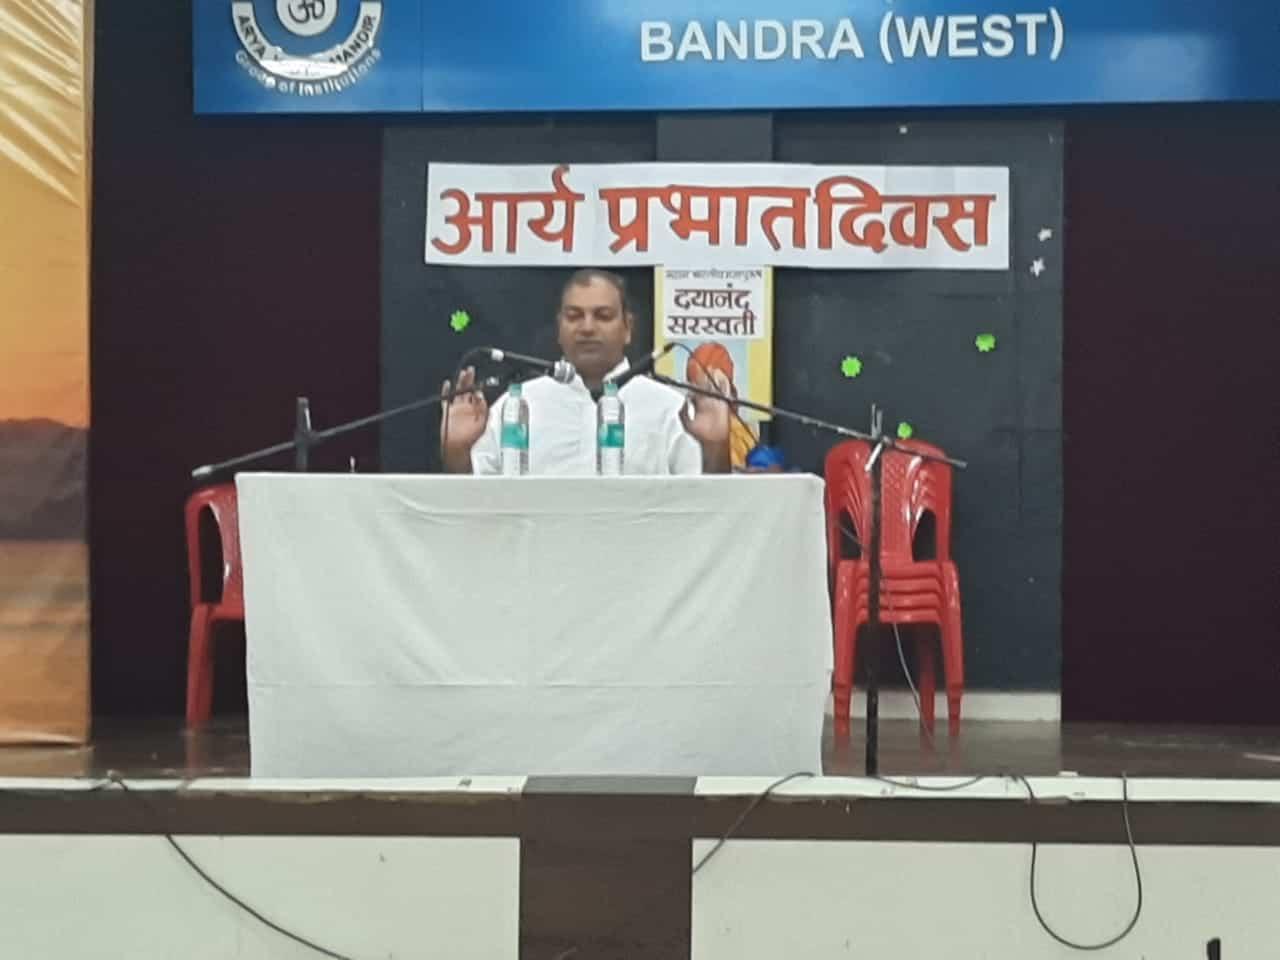 Celebration of Maharshi Dayanand Saraswati's Birthday, 12 February 2020